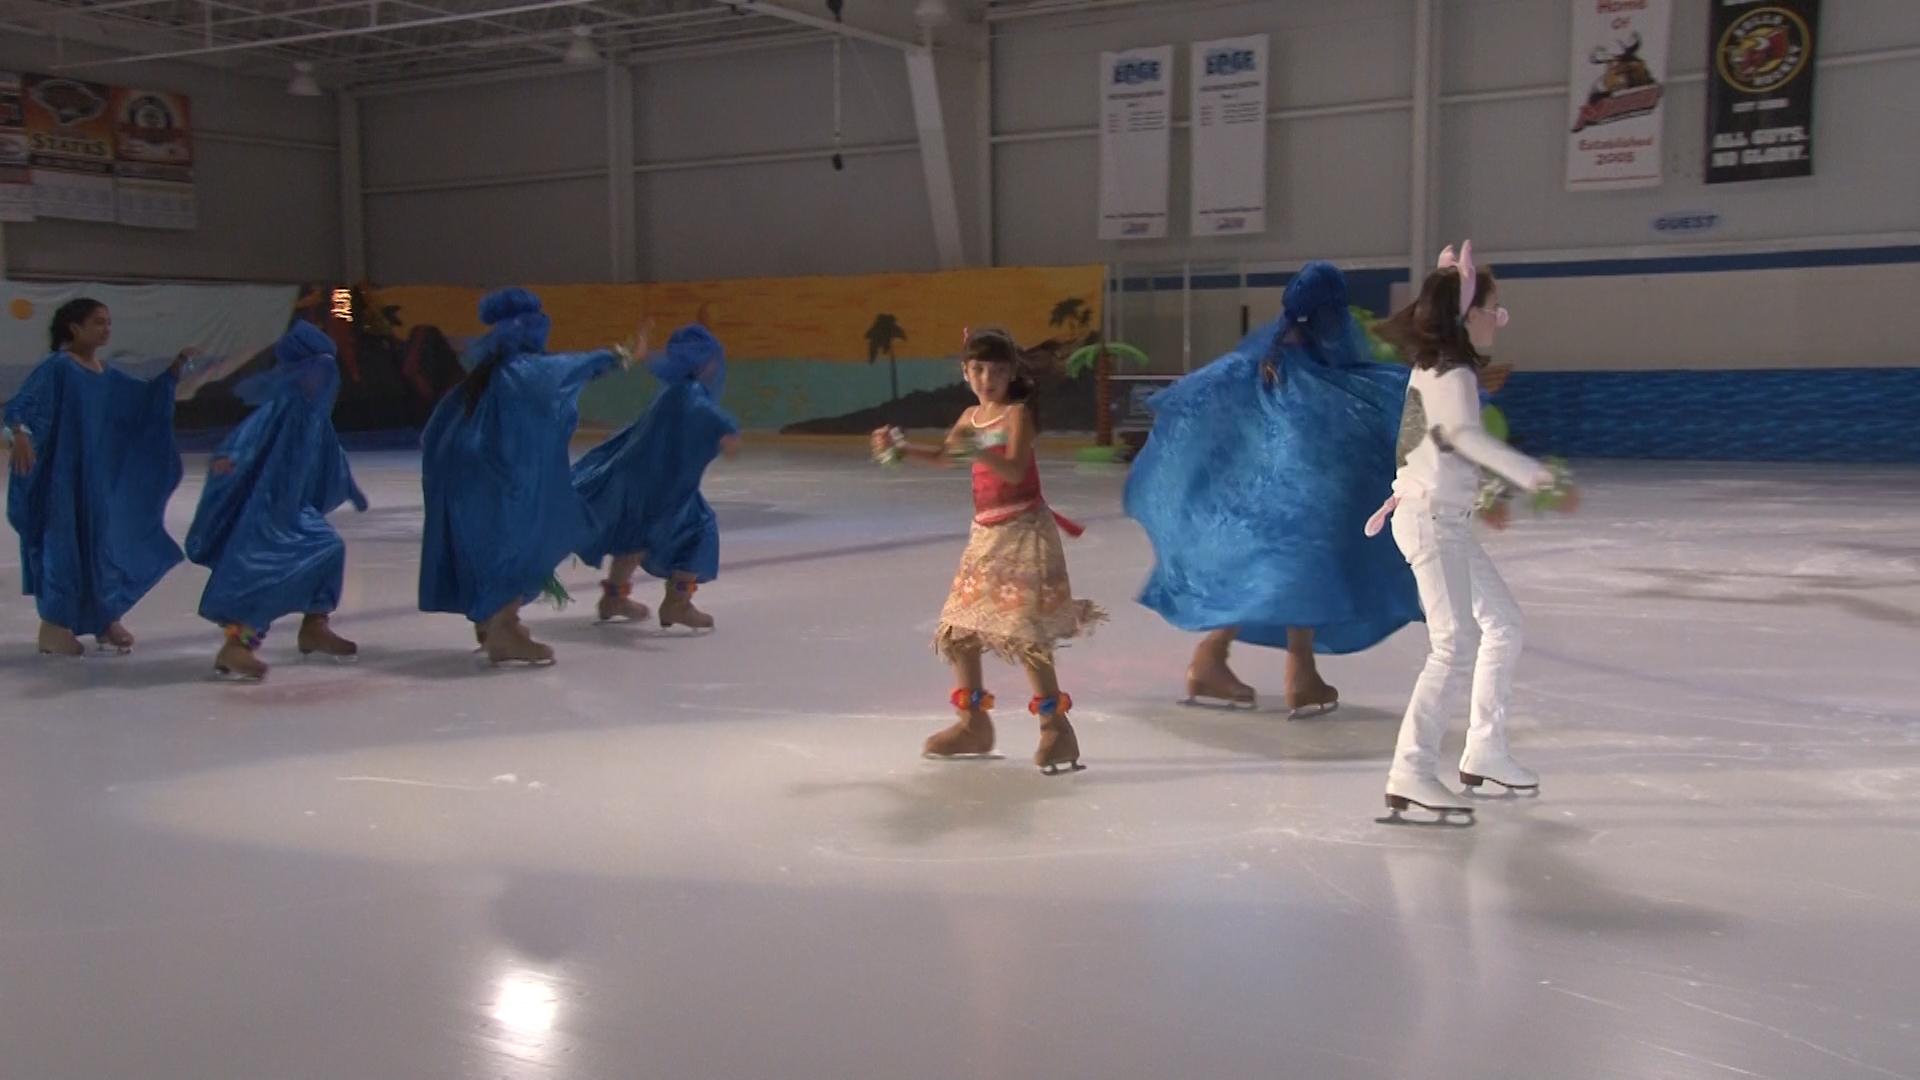 Power Play Maui Skate on Ice 071417.00_05_04_13.Still004.jpg